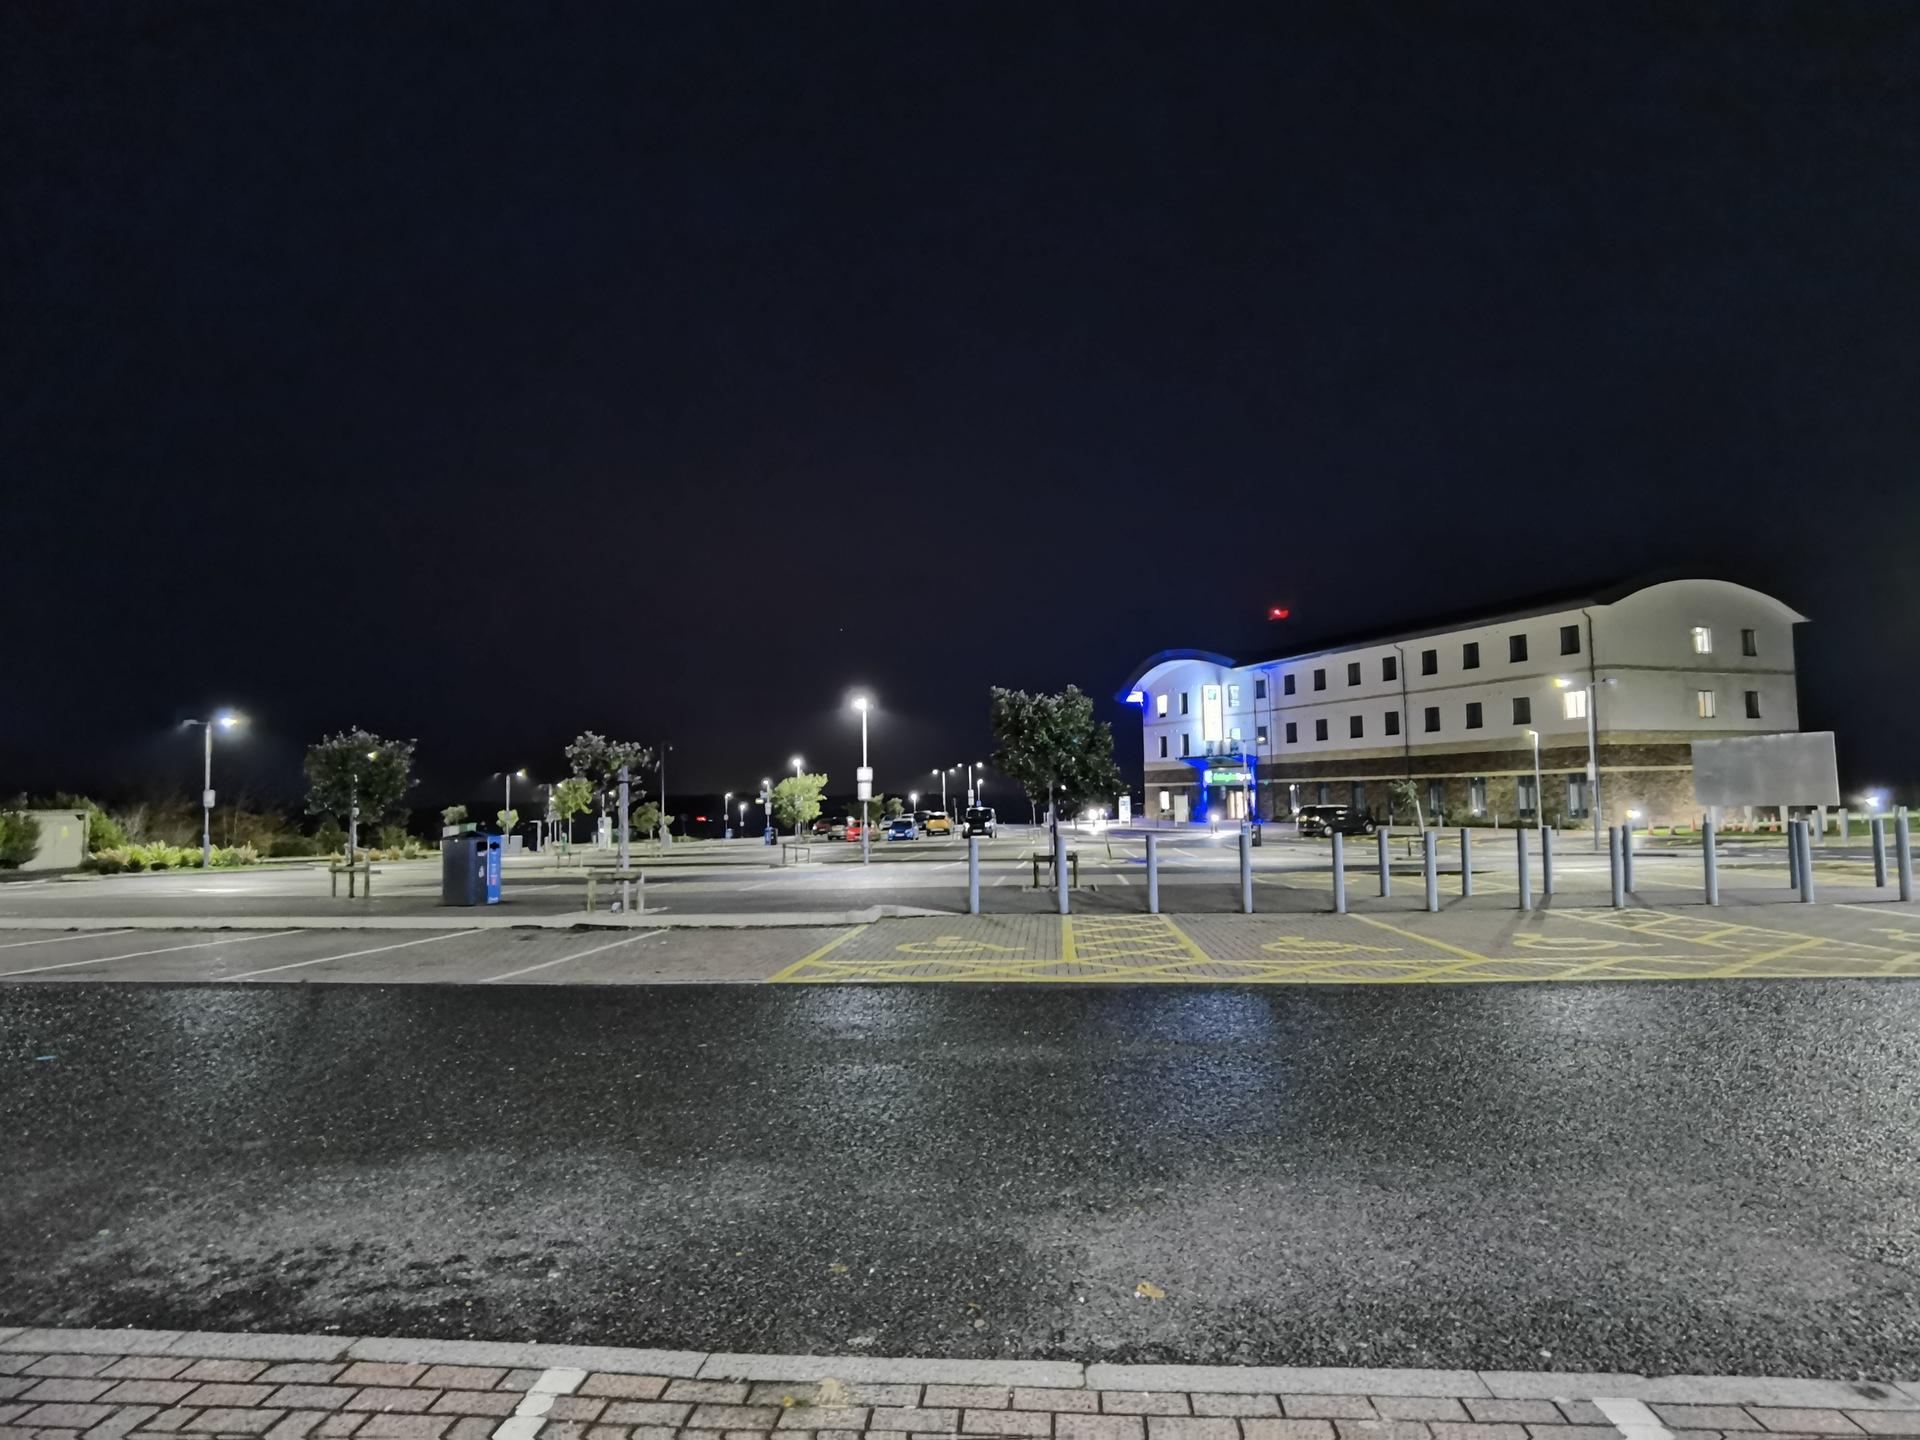 Huawei Mate 40 Pro ultrawide night sample of a car park